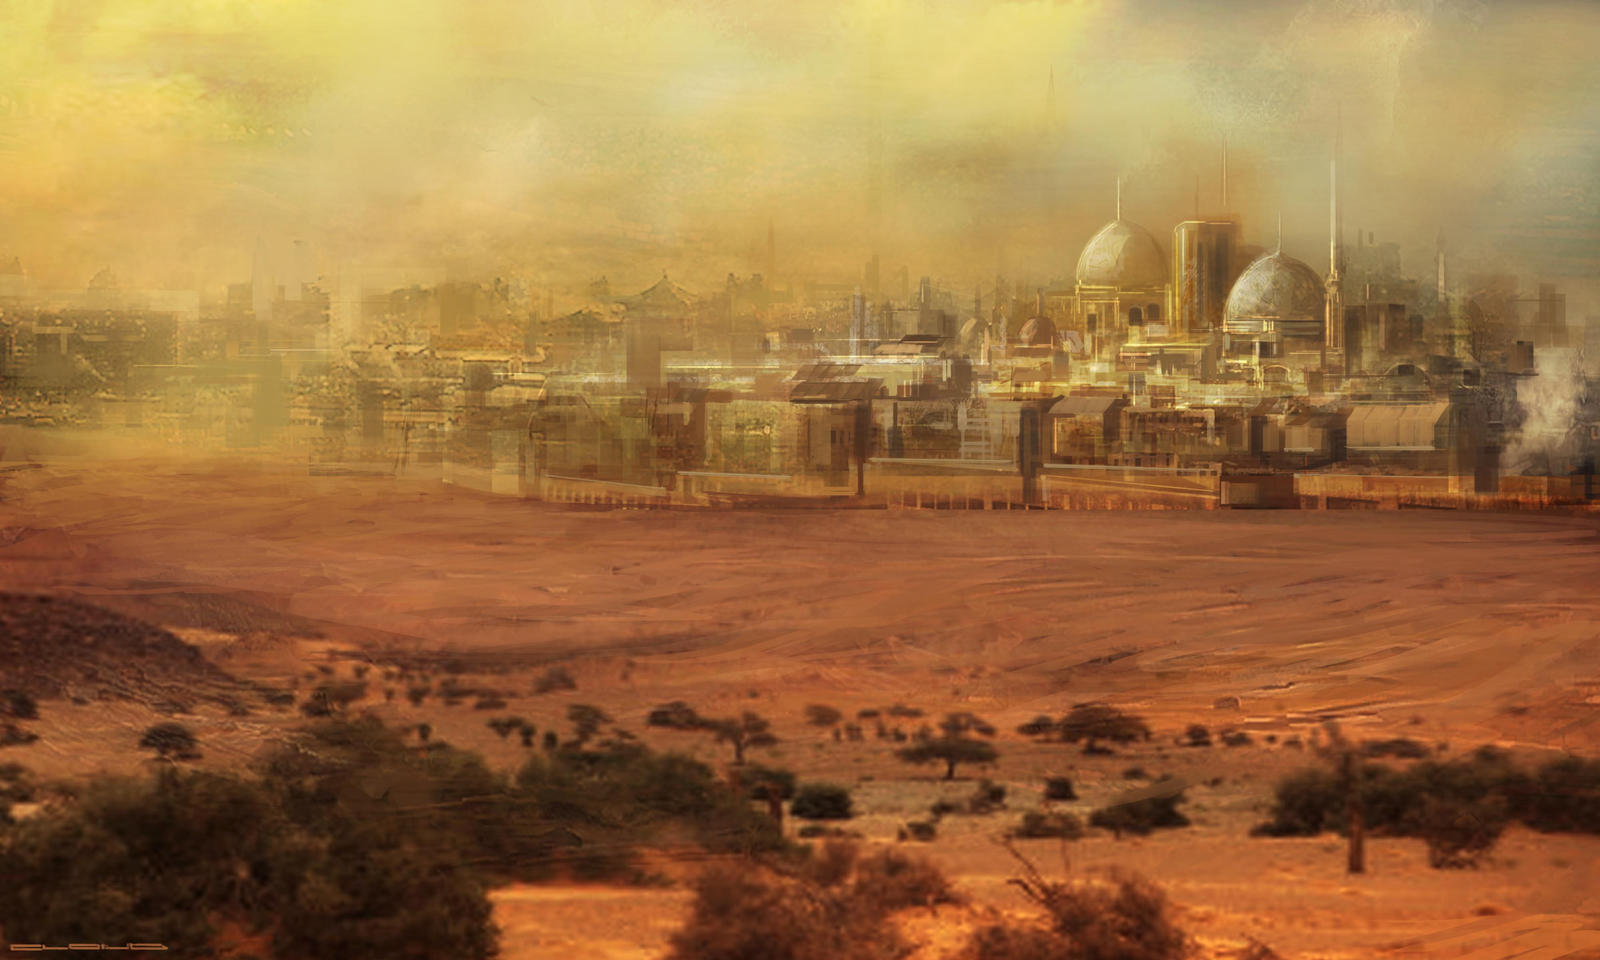 large_desert_city_dvg_by_cloudminedesign-d6bnvmx.jpg